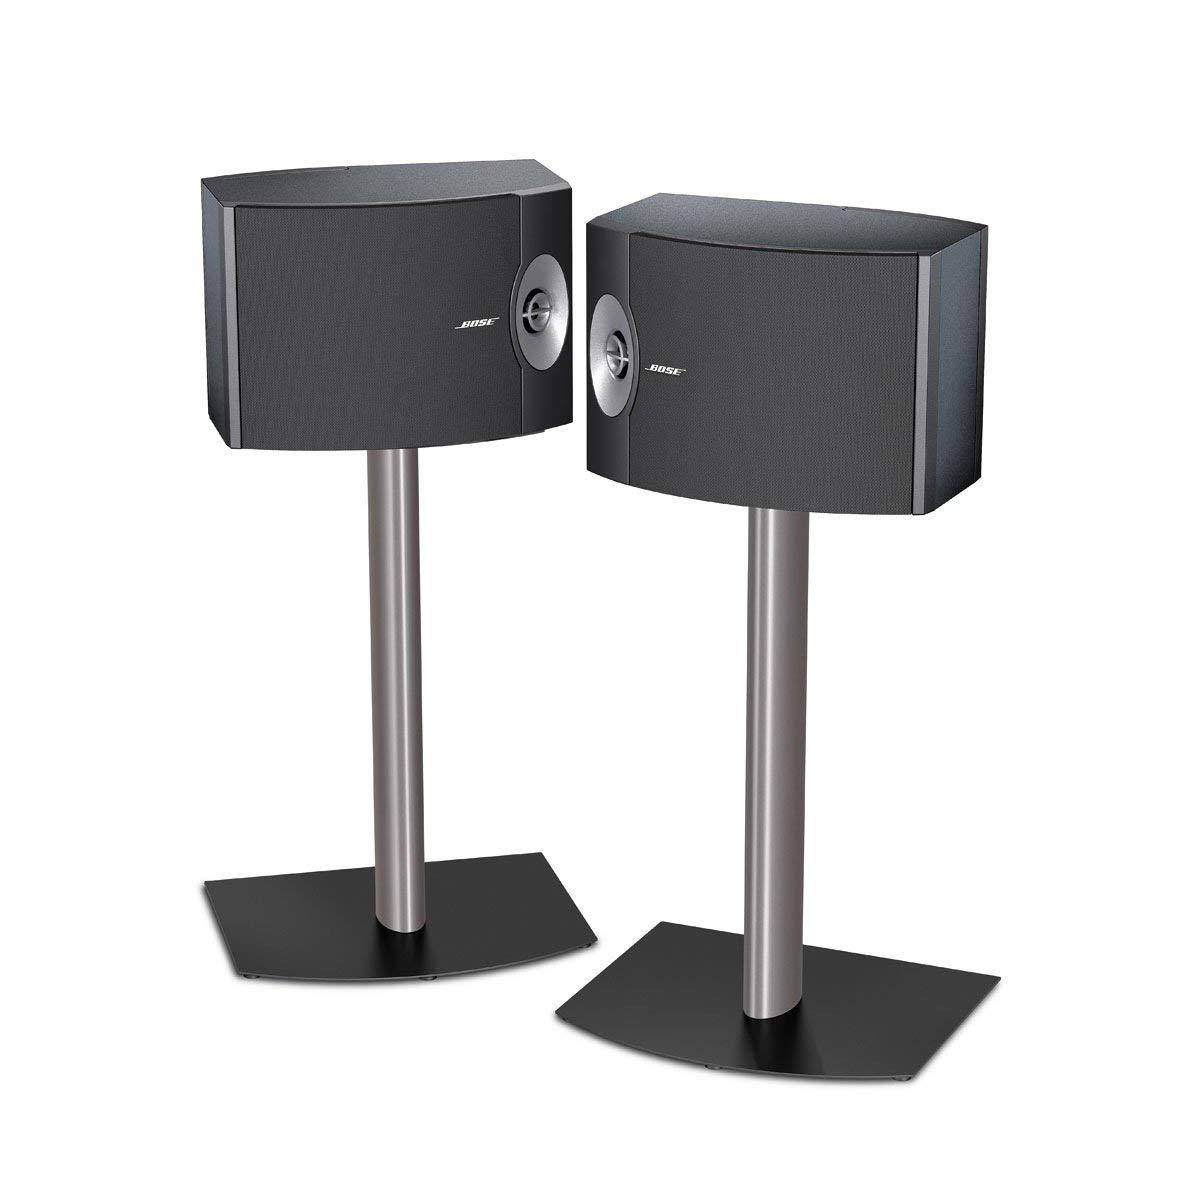 Loa Bose 301 Series V | hayaudio.com